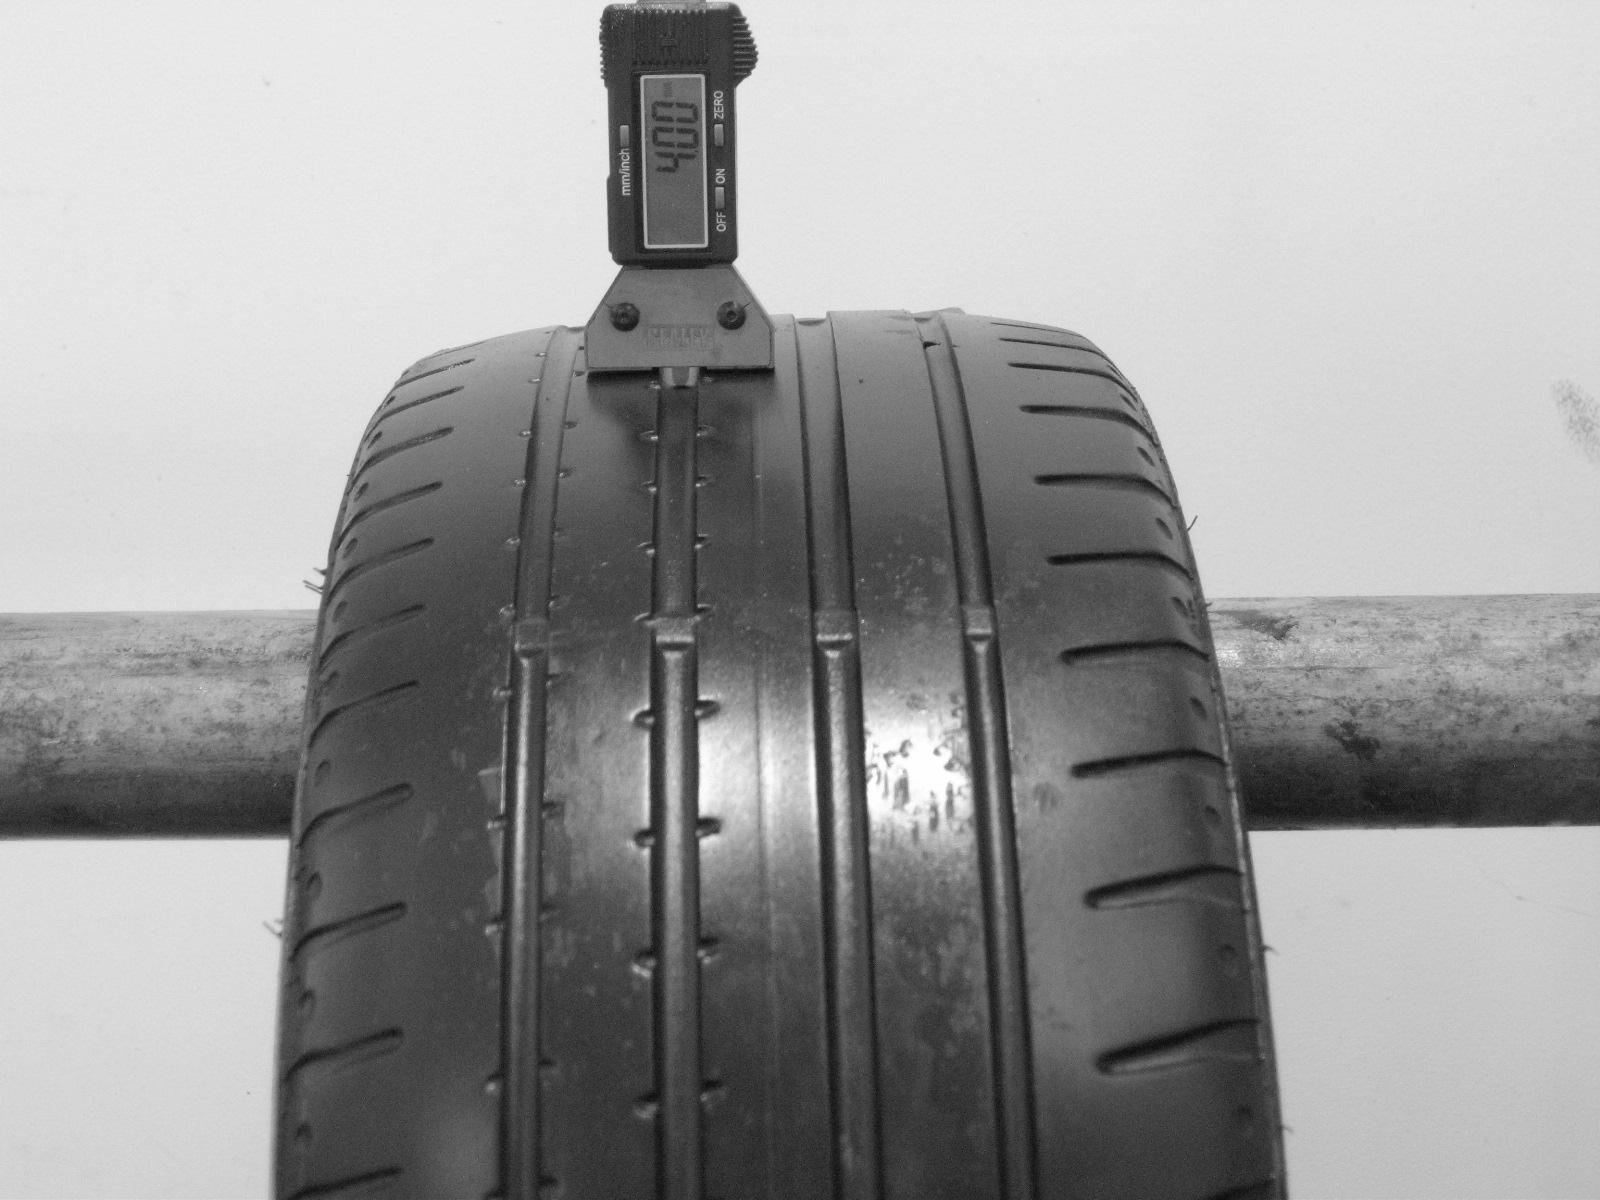 Použité-Pneu-Bazar - 195/40 R16 CONTINENTAL SPORTCONTACT 2 -kusovka-rezerva 3mm